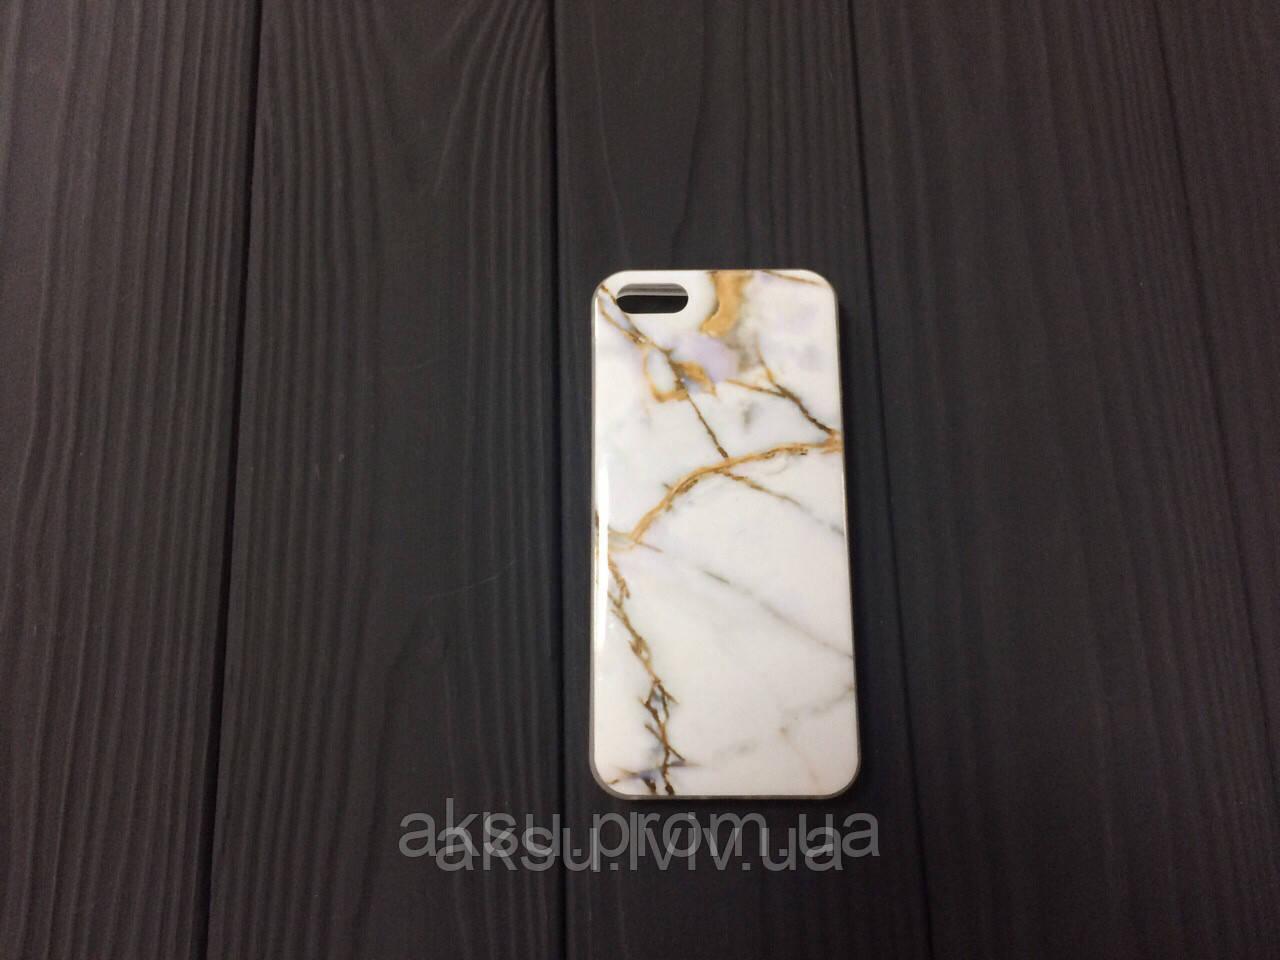 Чехол MarMor для iPhone 5/5s/Se